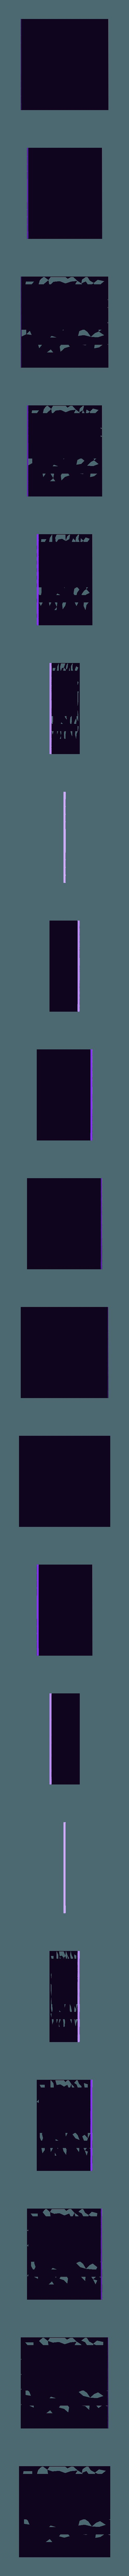 Cavern_River_Plain_2.0.stl Download free STL file Cavern River Tiles (Openforge 2.0 compatible) • Template to 3D print, Poxos